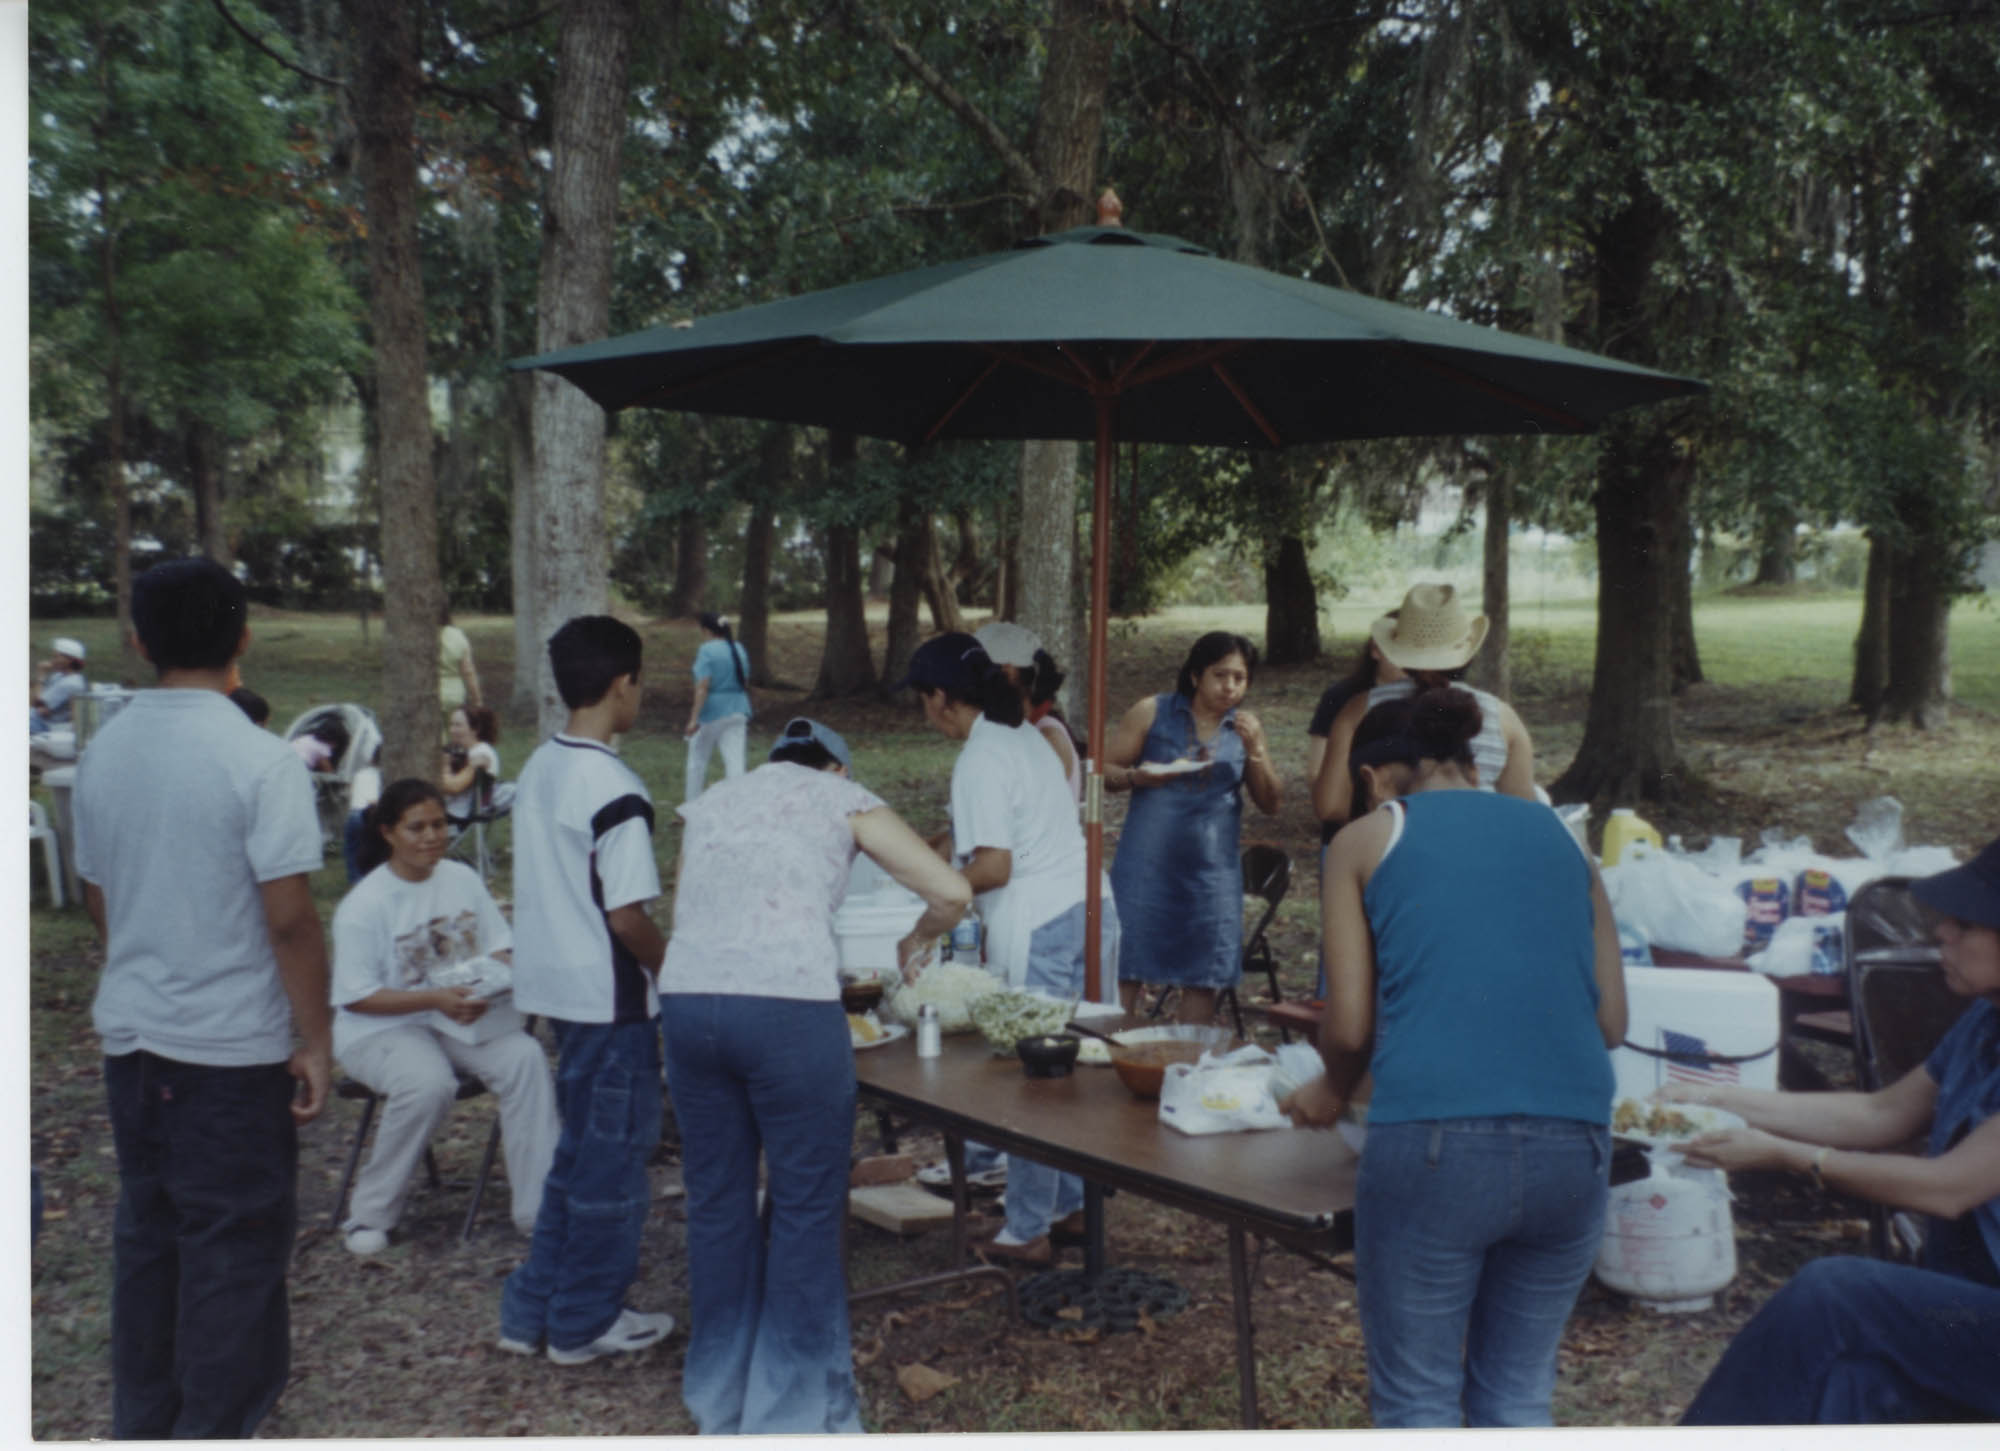 Fotografía de un festival comunitario / Photograph of Community Festival